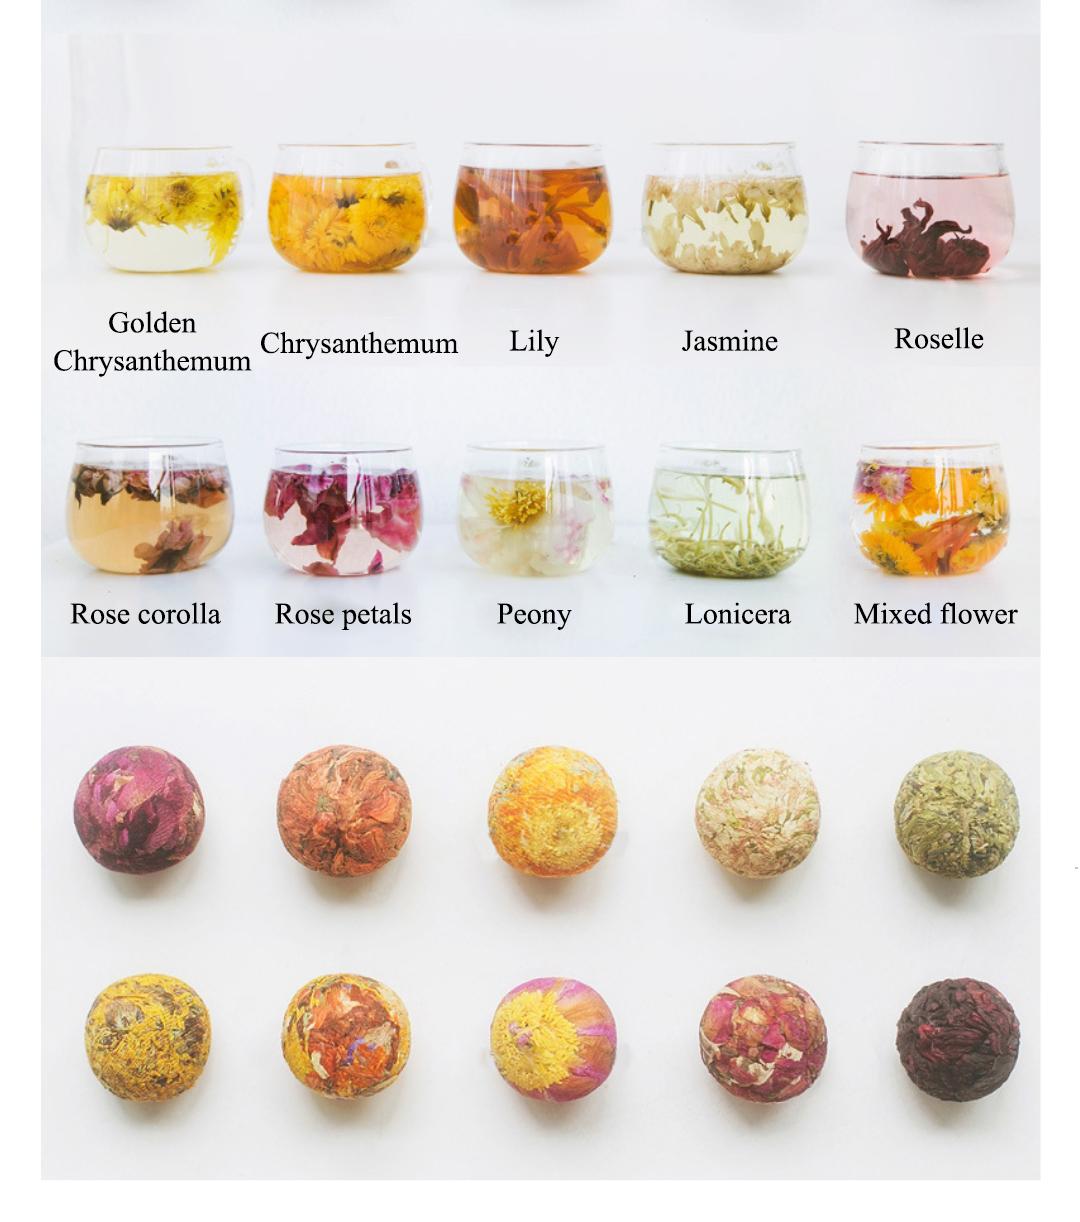 Private Label Beautiful Blooming Tea Blossom Flower Tea Ball Handmade Packaging Organic Detox Herbal Flower Tea Ball - 4uTea | 4uTea.com